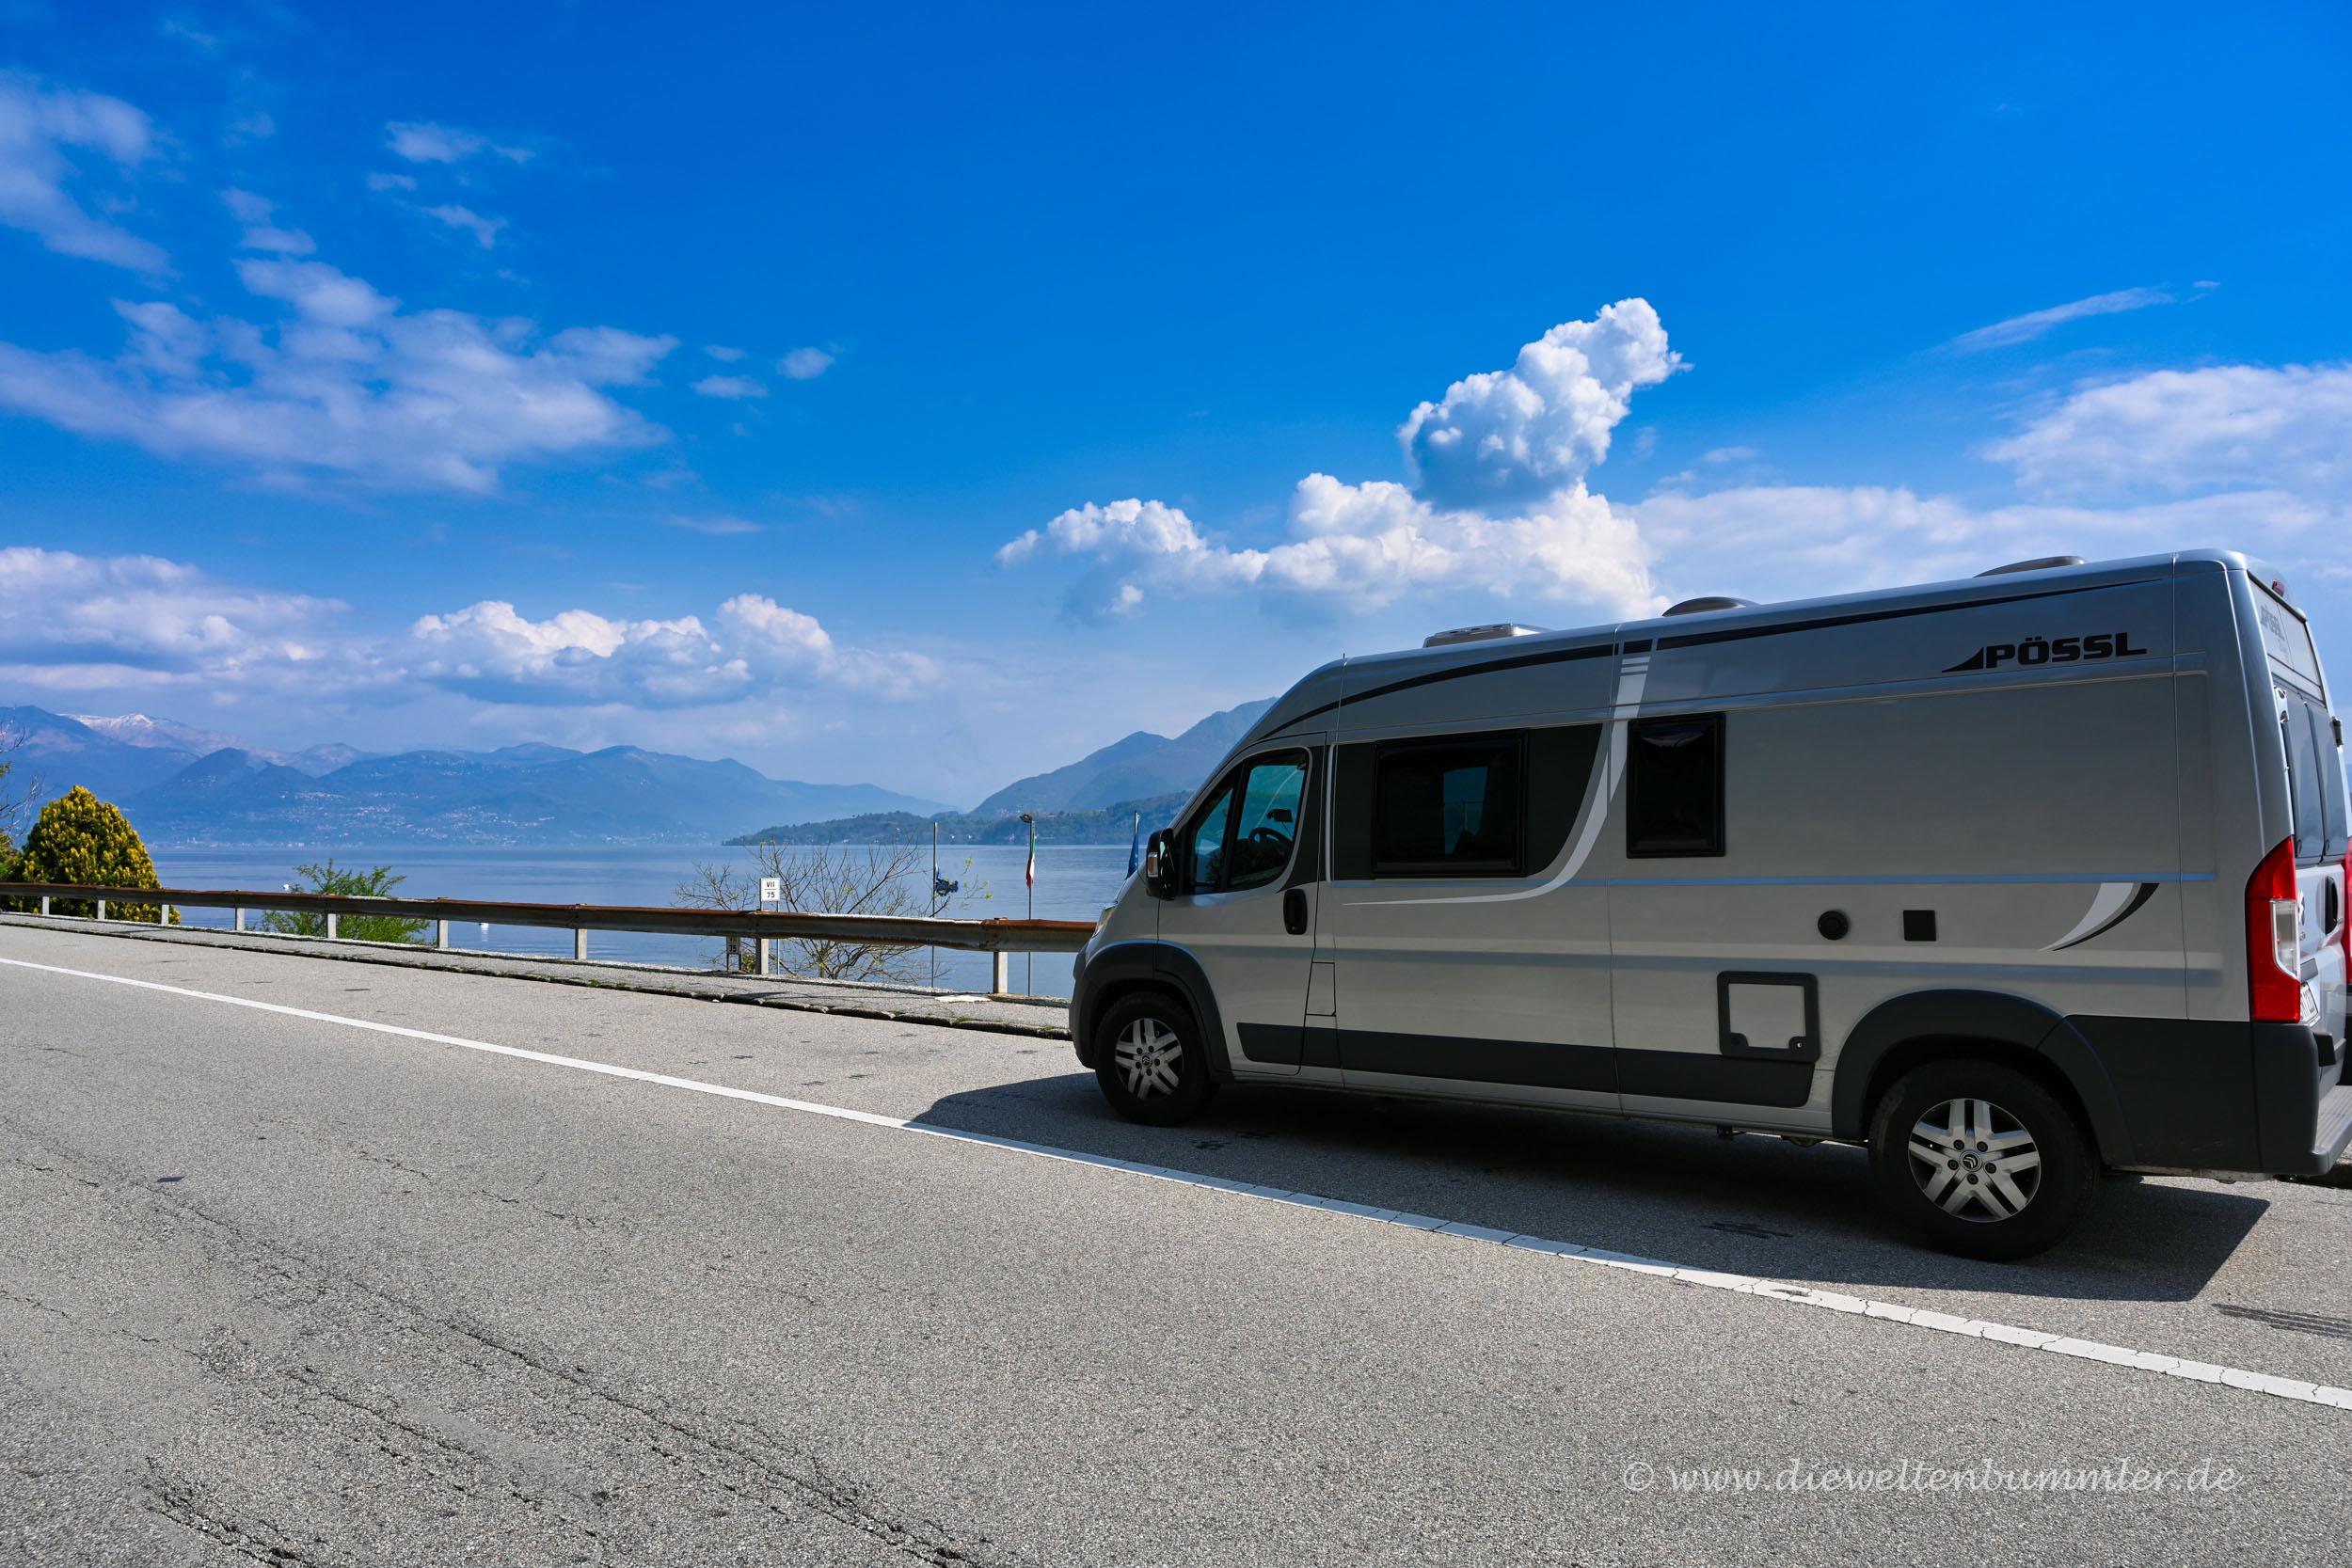 Mit dem Wohnmobil zum Lago Maggiore